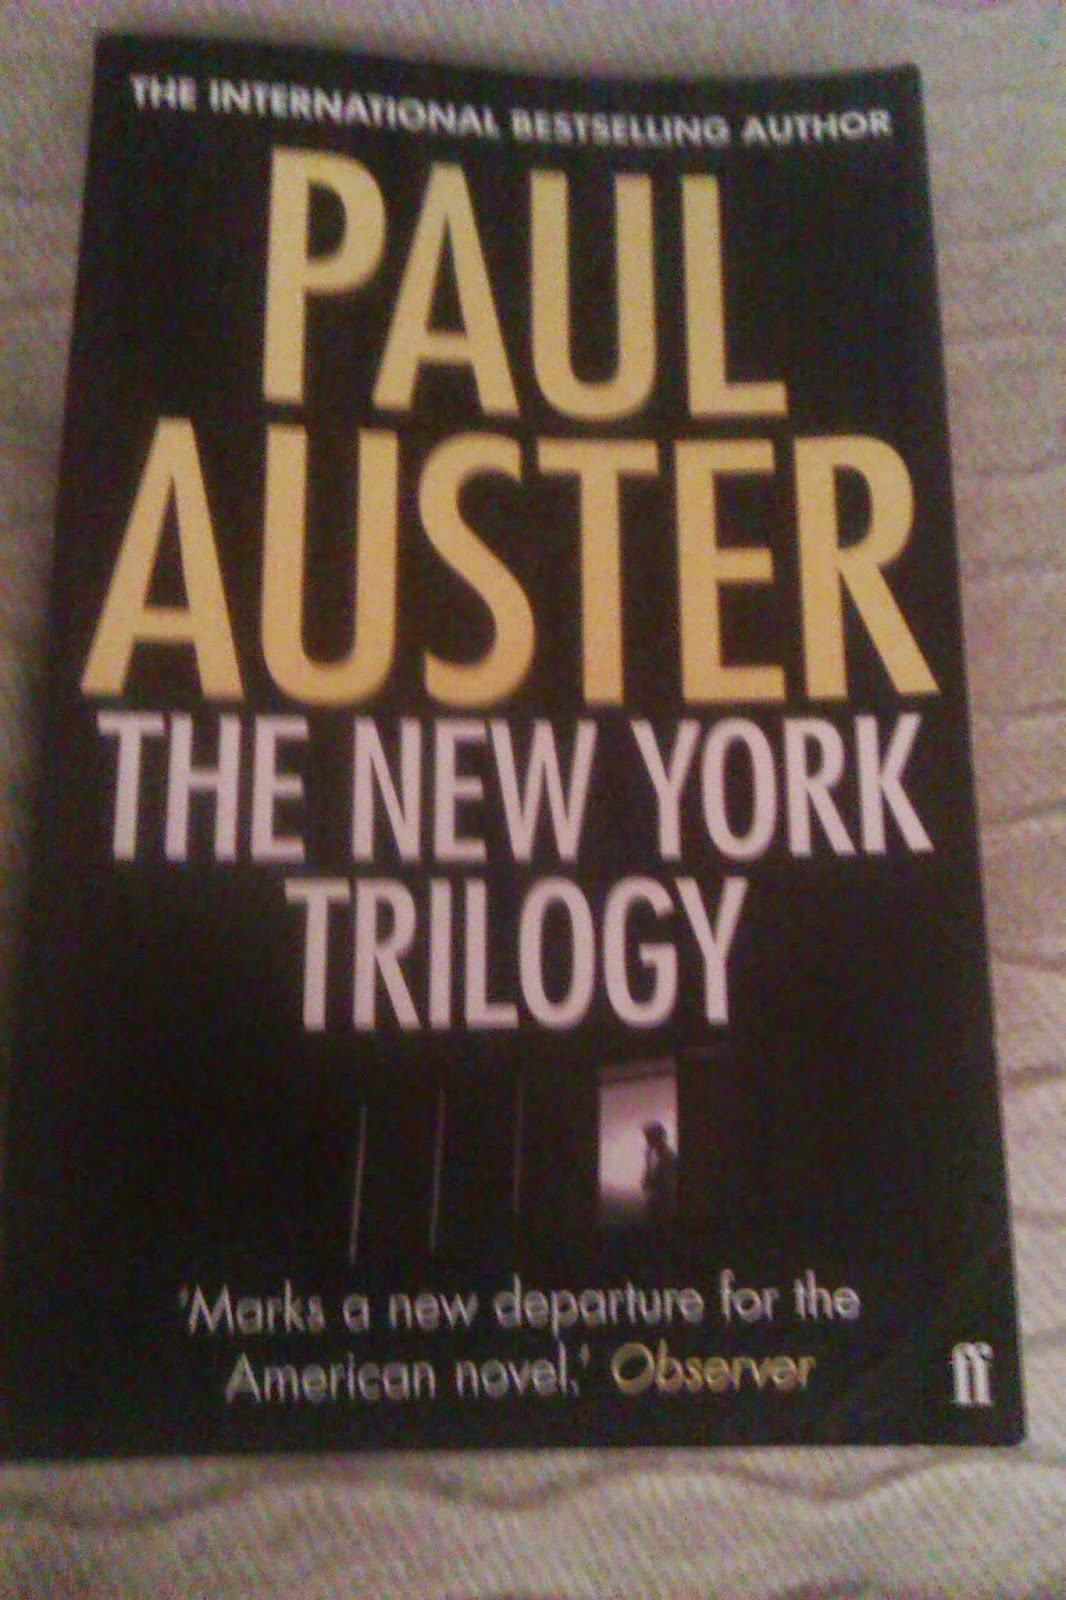 paul auster new york trilogy